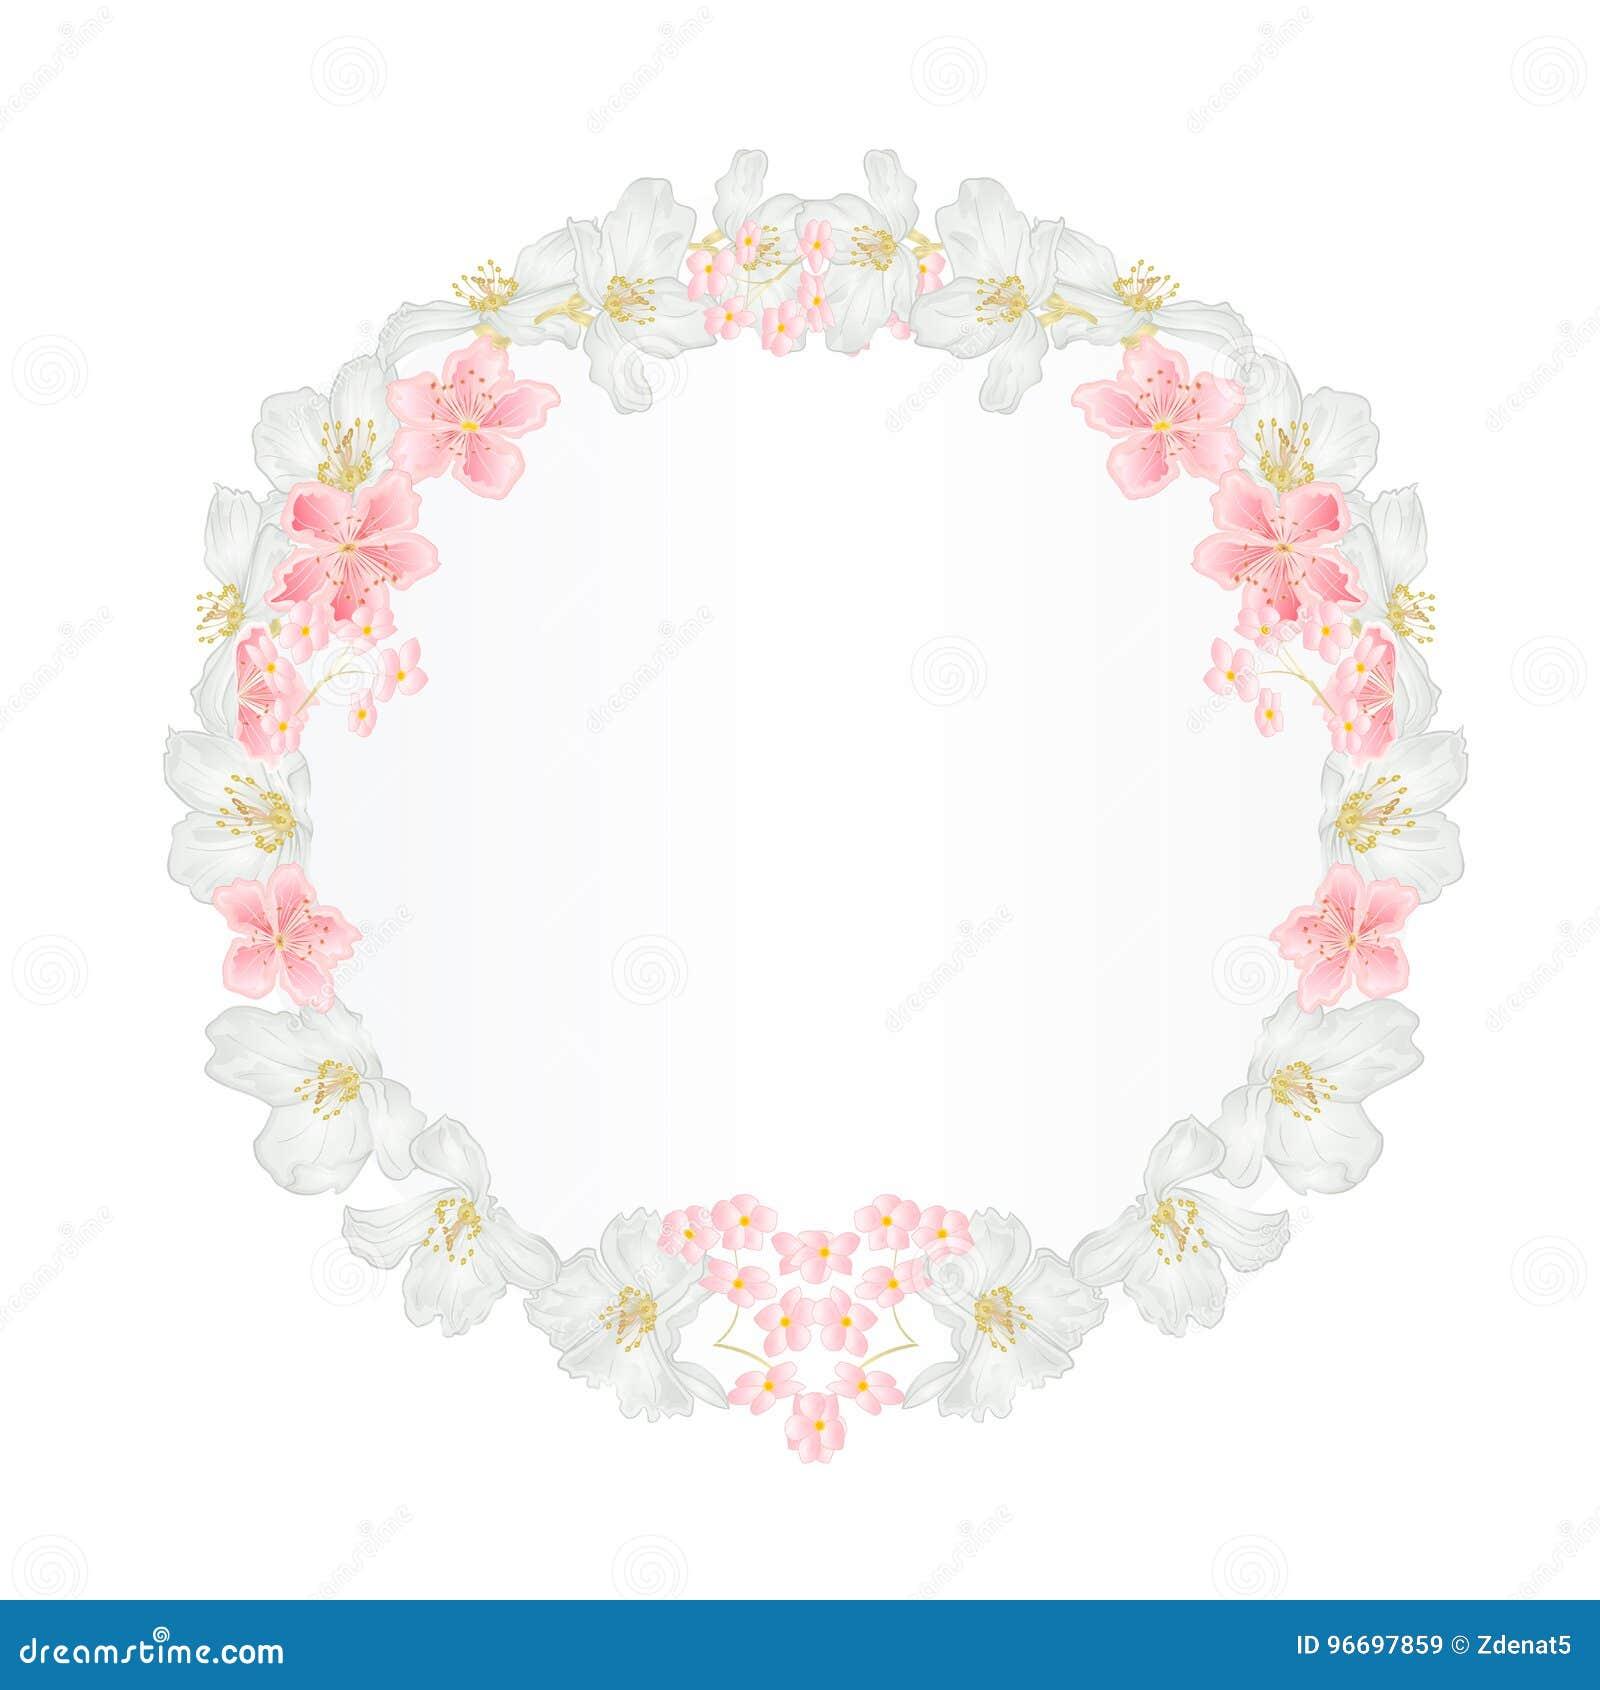 8ad4bb063 Floral round frame with Jasmine and sakura vintage festive background  illustration